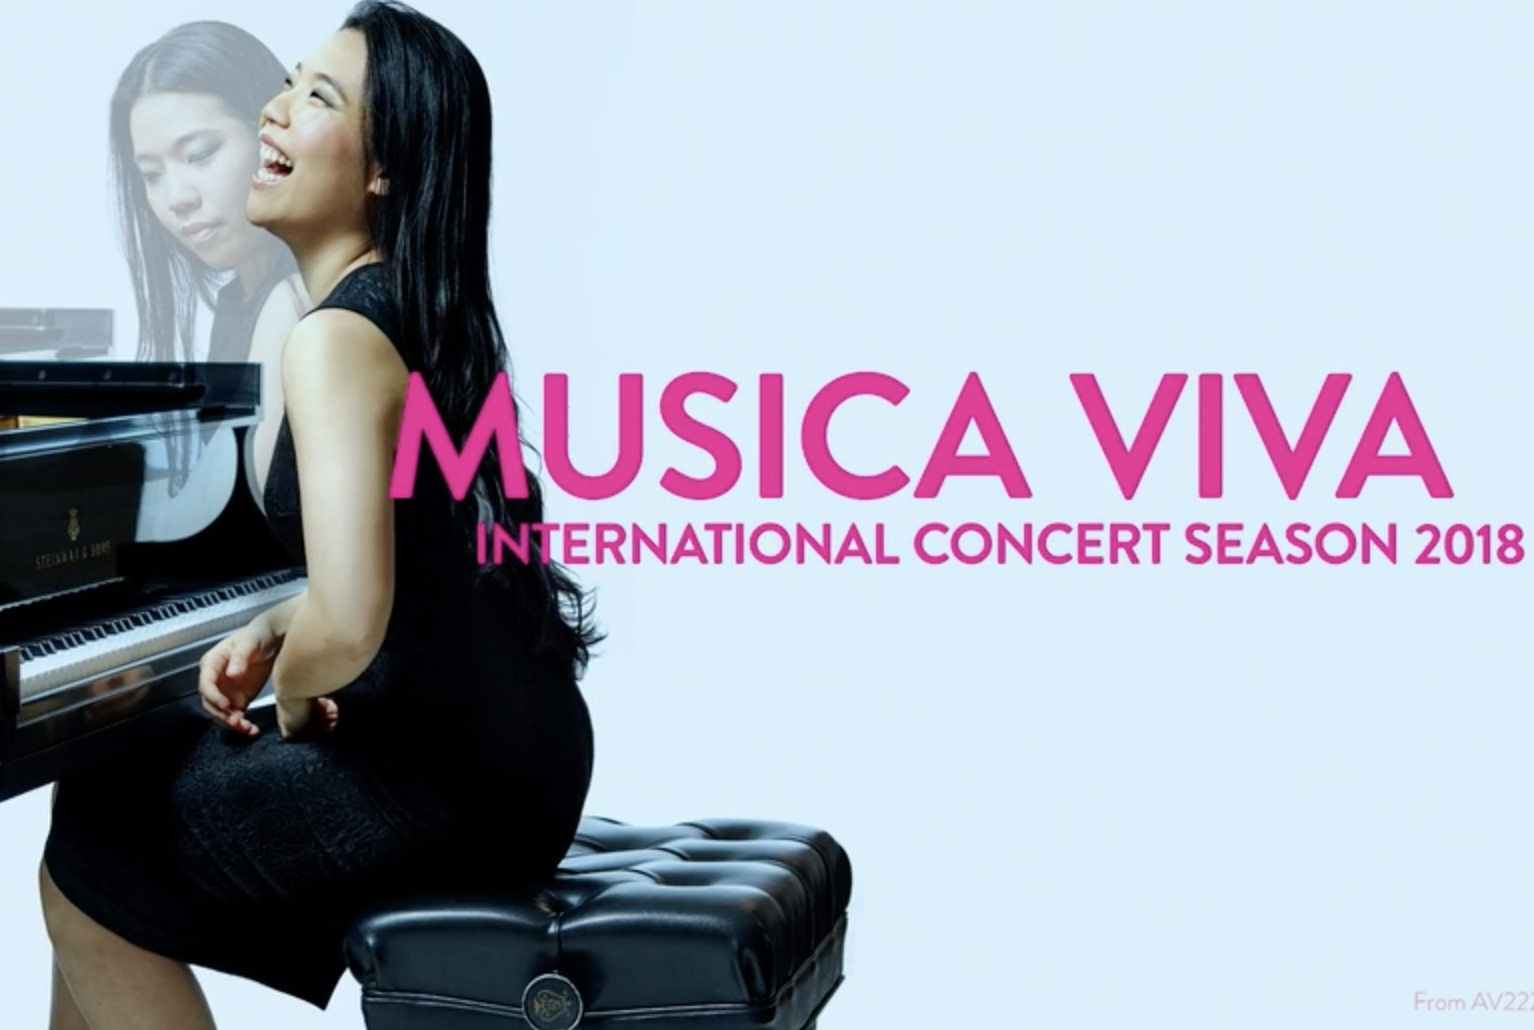 Video: Musica Viva (filmed by Keith Saunders)